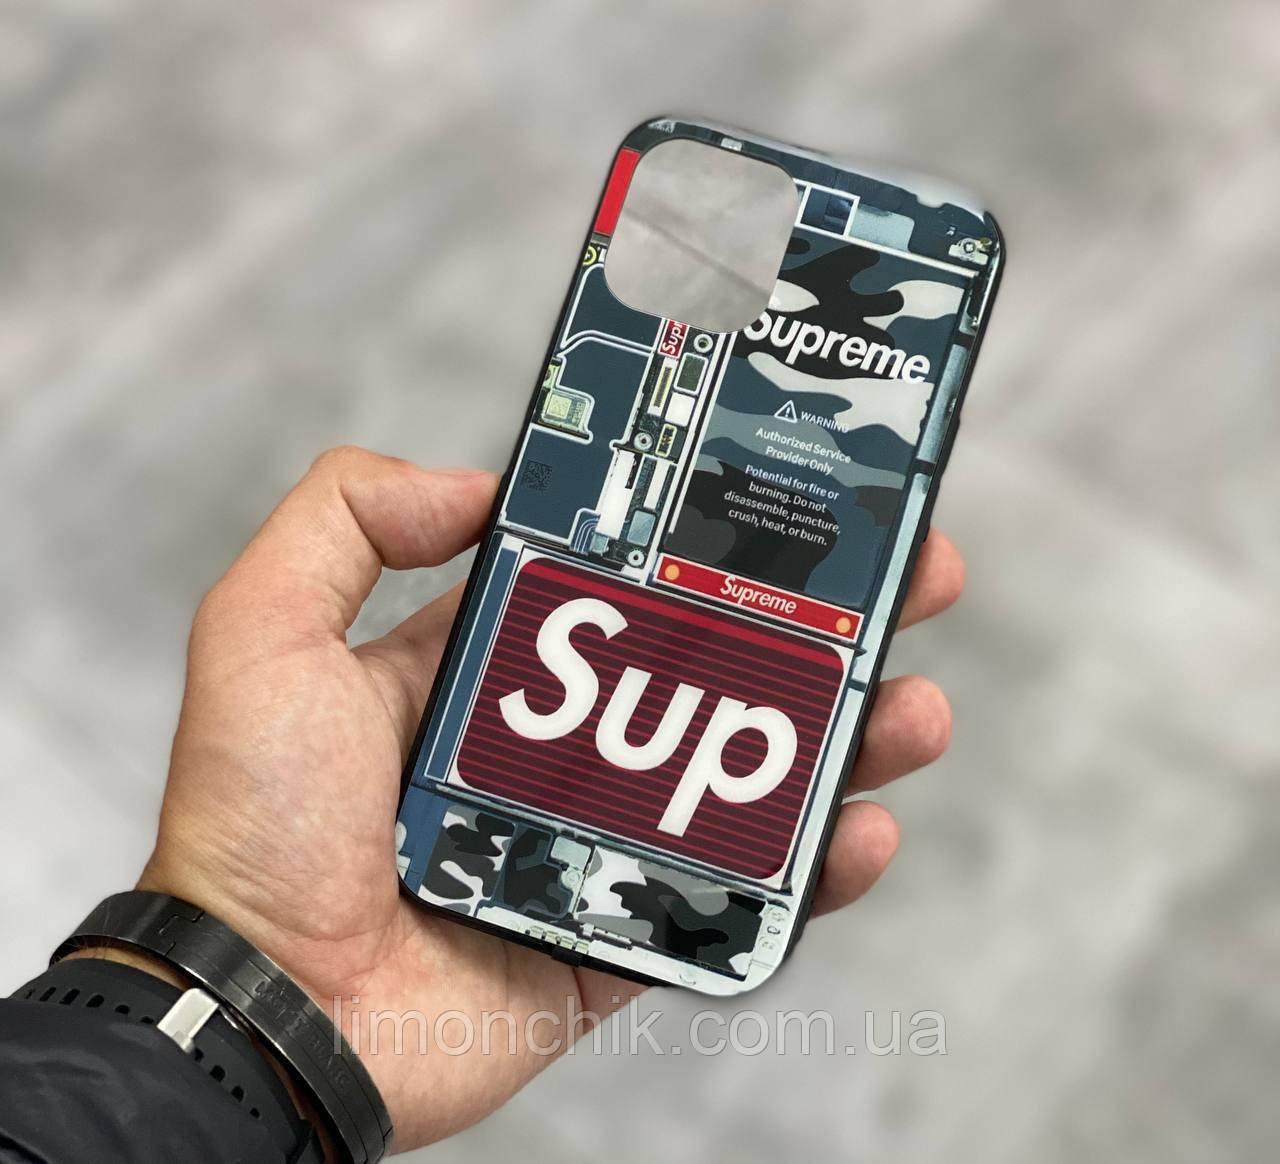 Чехол на айфон iphone с разноцветной Led подсветкой накладка для айфон лед 22-ве расцветки